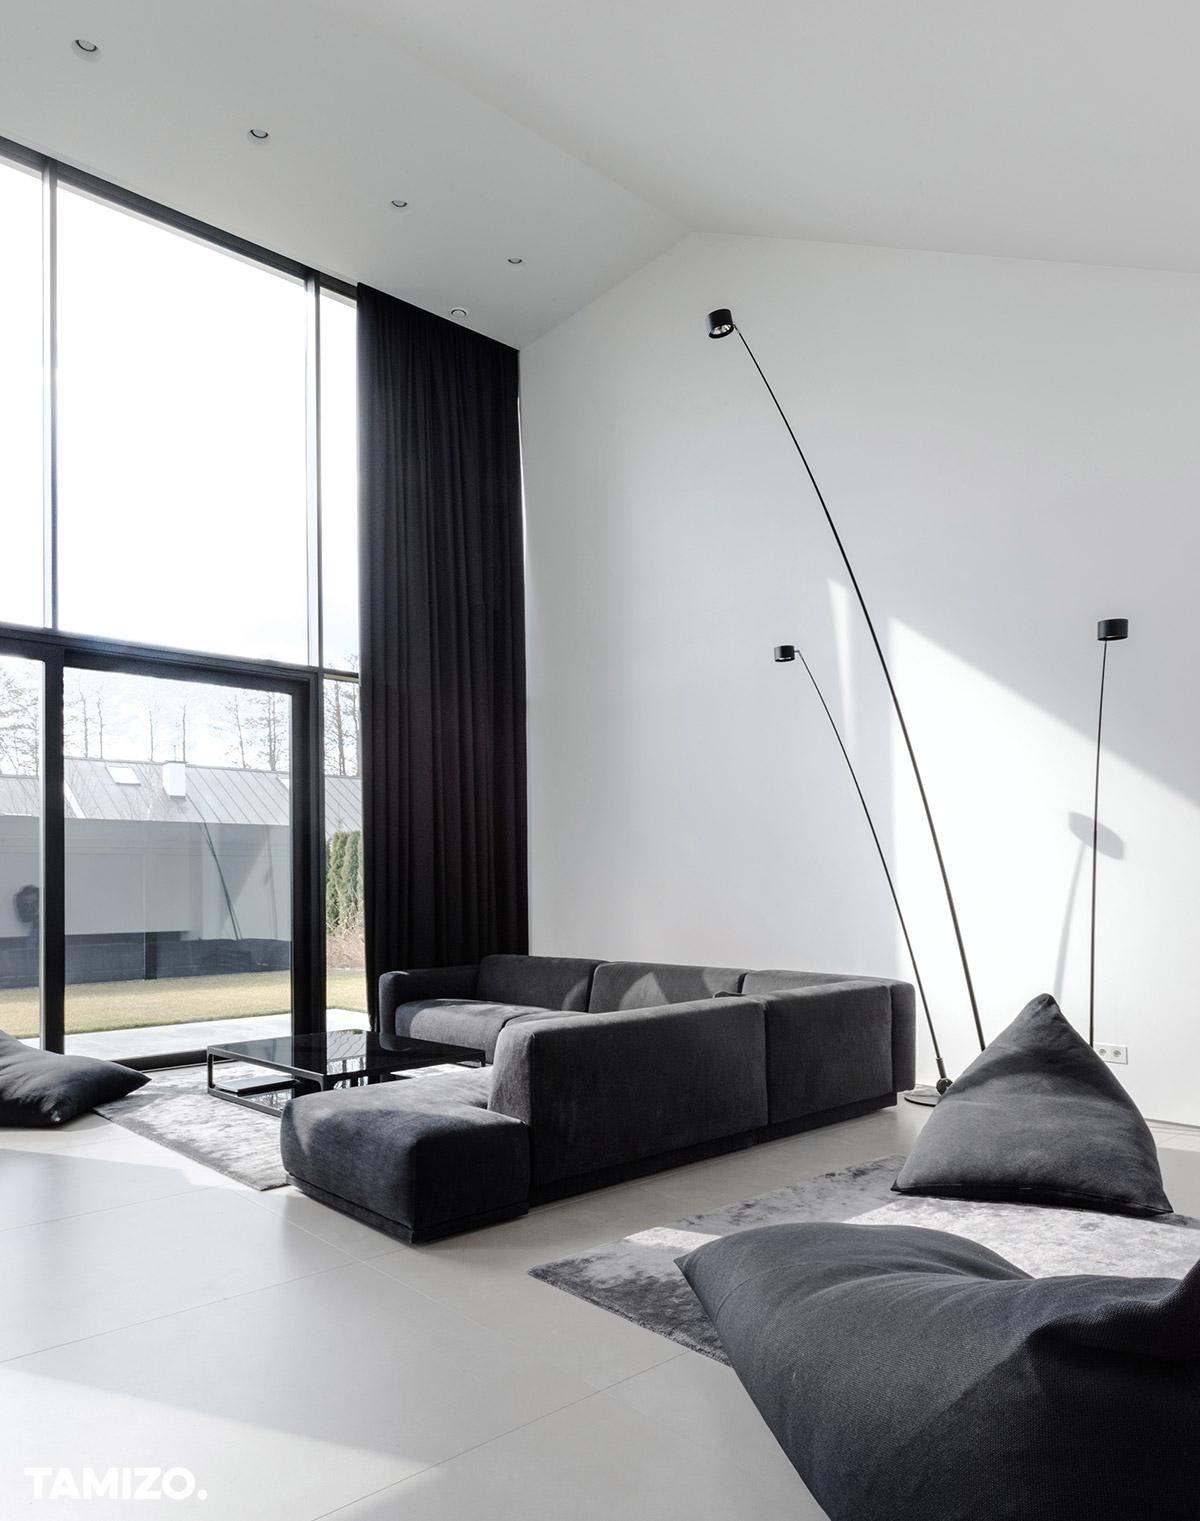 001_tamizo_architects_interior_house_realization_warsaw_poland_19